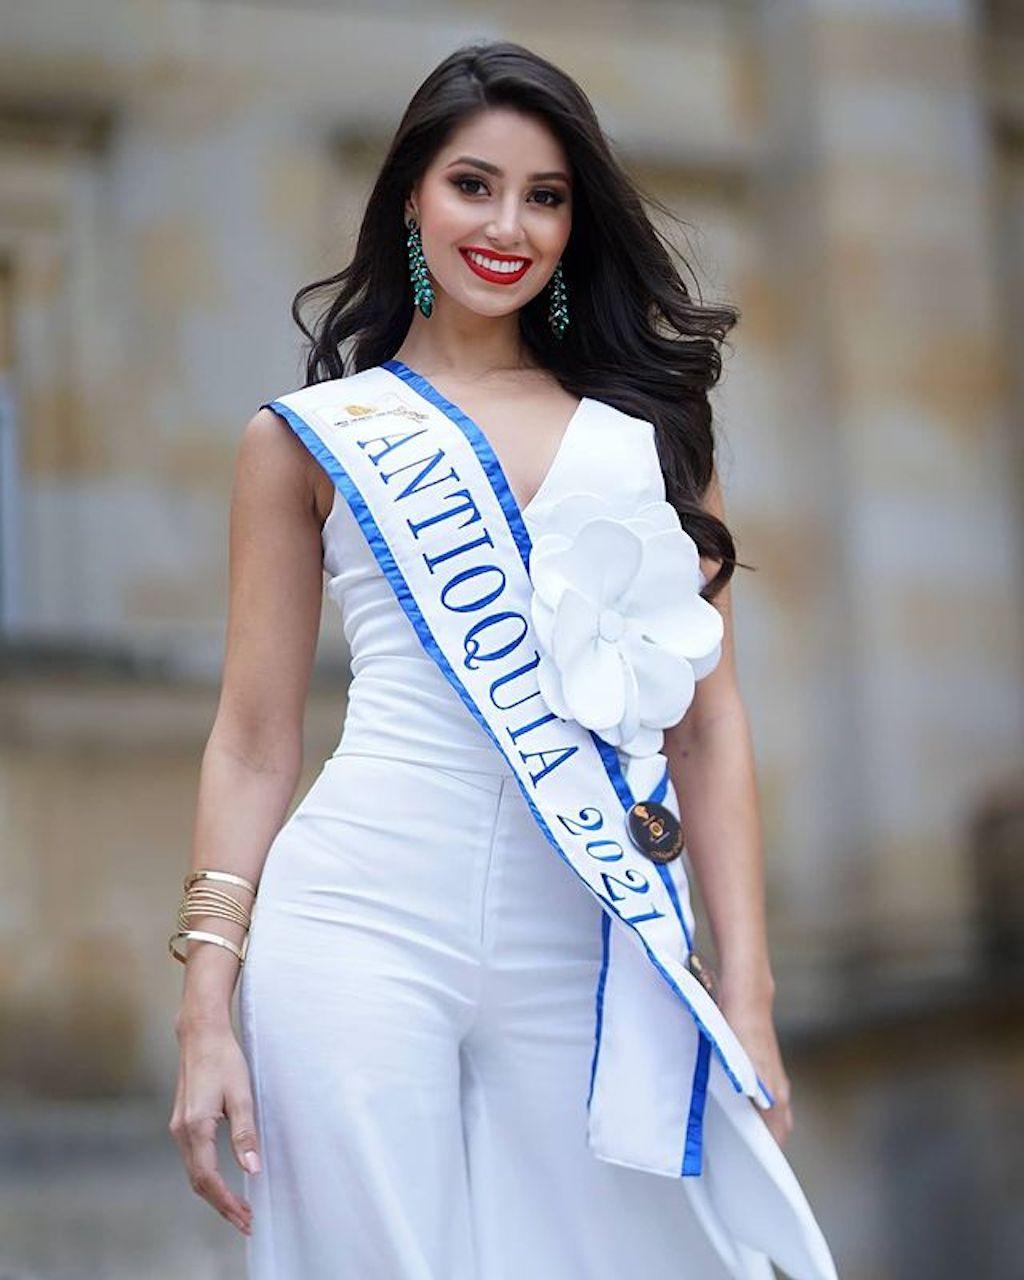 Andrea Aguilera - Tân Hoa hậu thế giới Colombia 2021